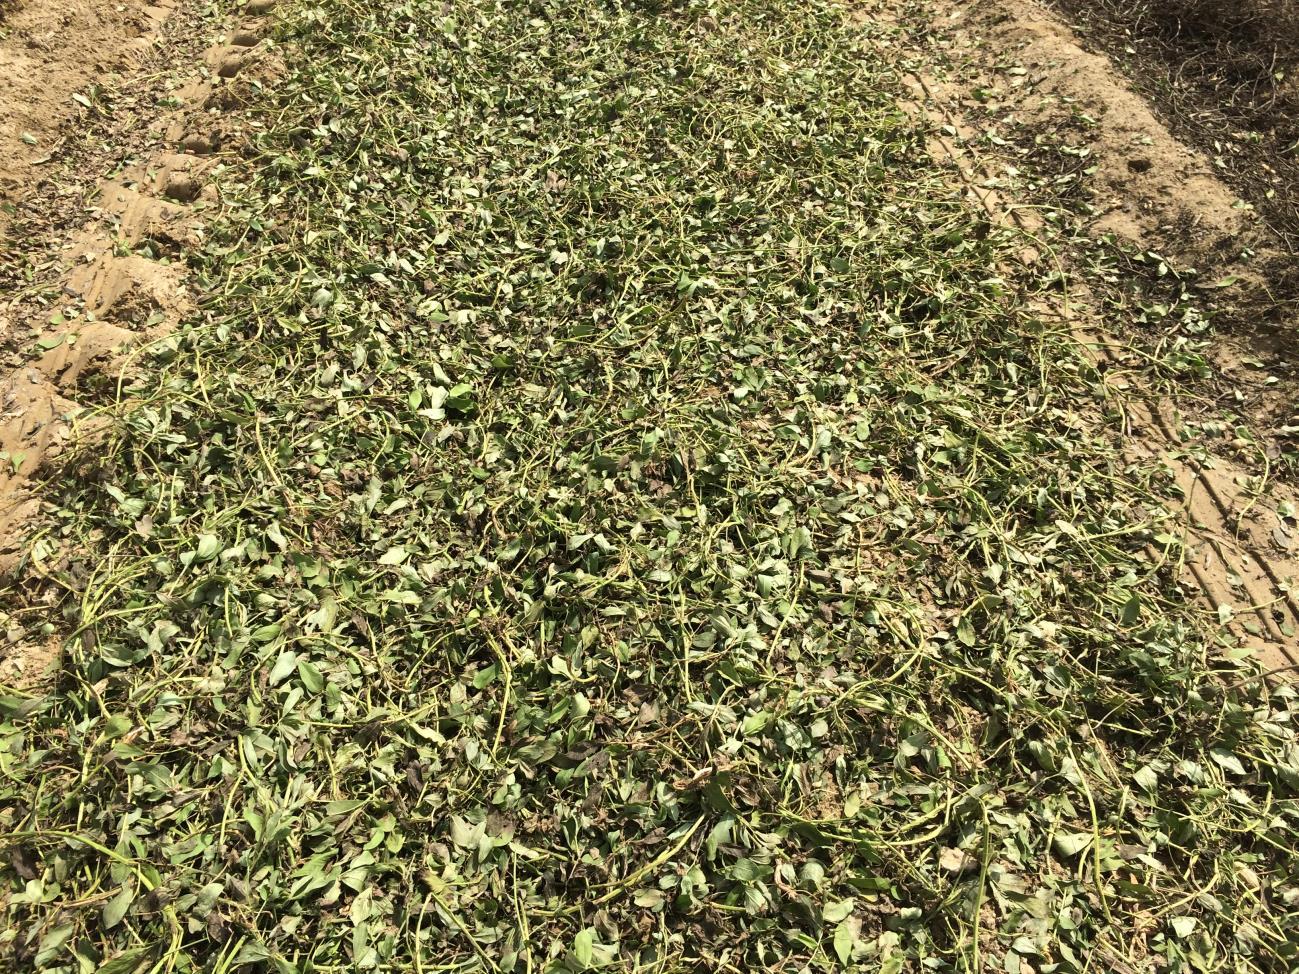 peanut field after combining.